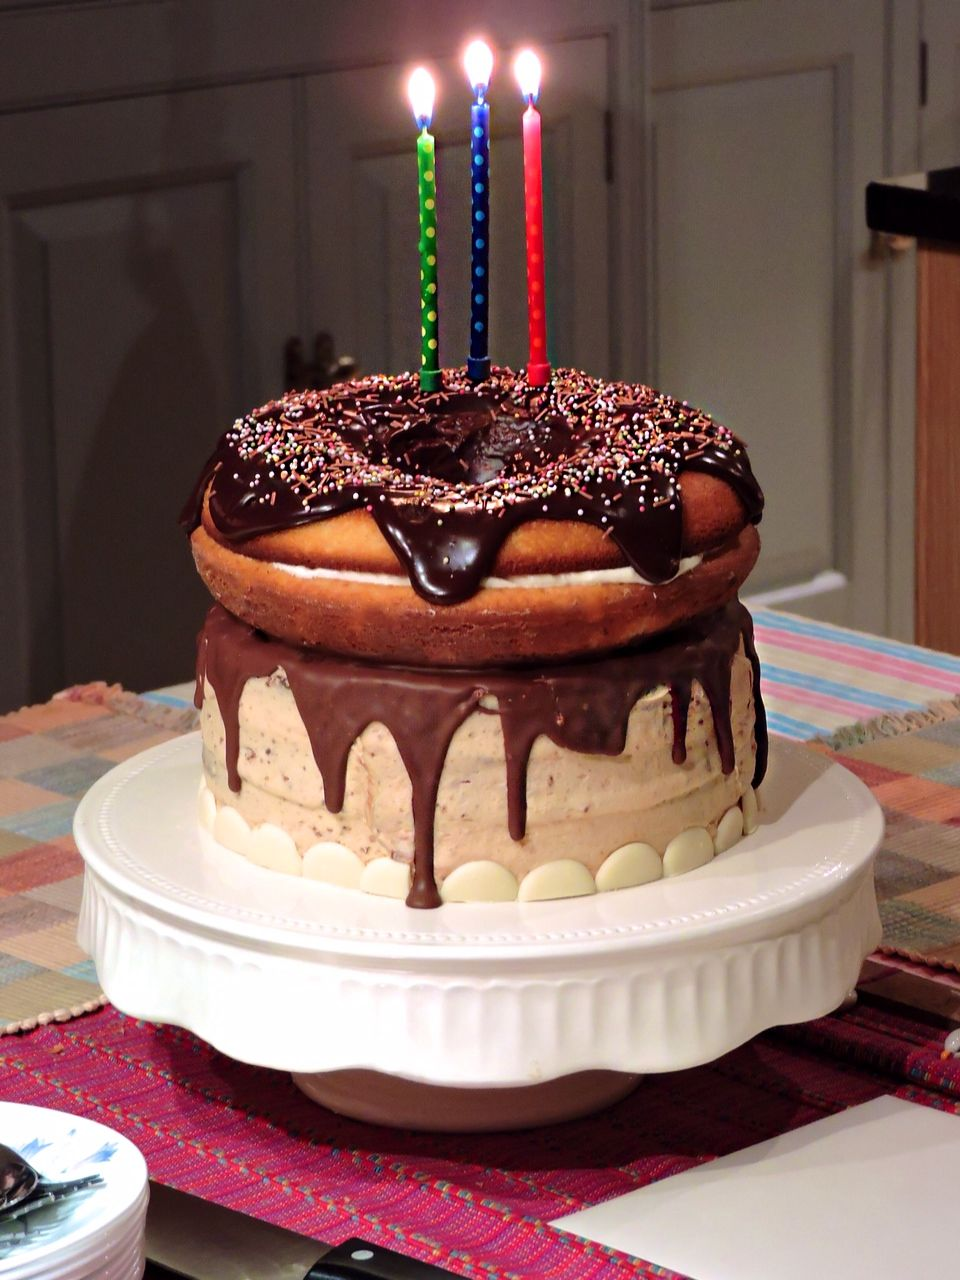 Giant Doughnut Birthday Cake Doughnuts Birthday cakes and Birthdays